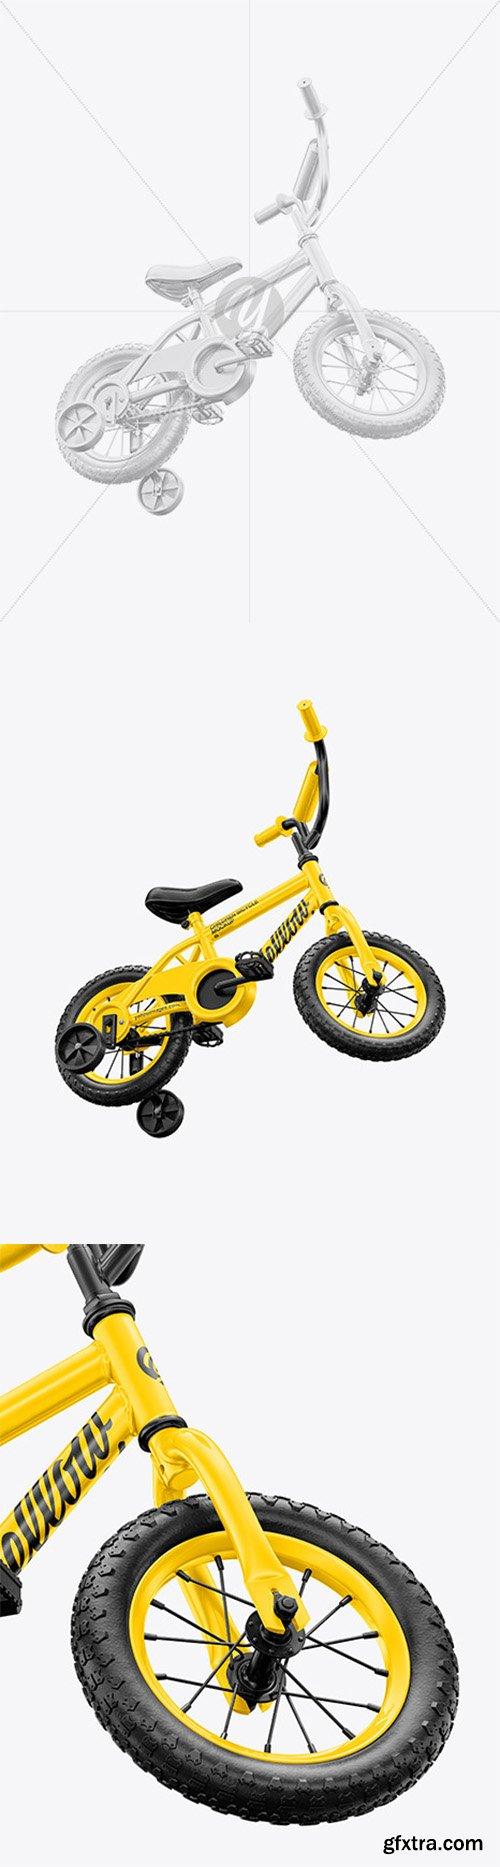 Children Bike Mockup - Half Side View 66100